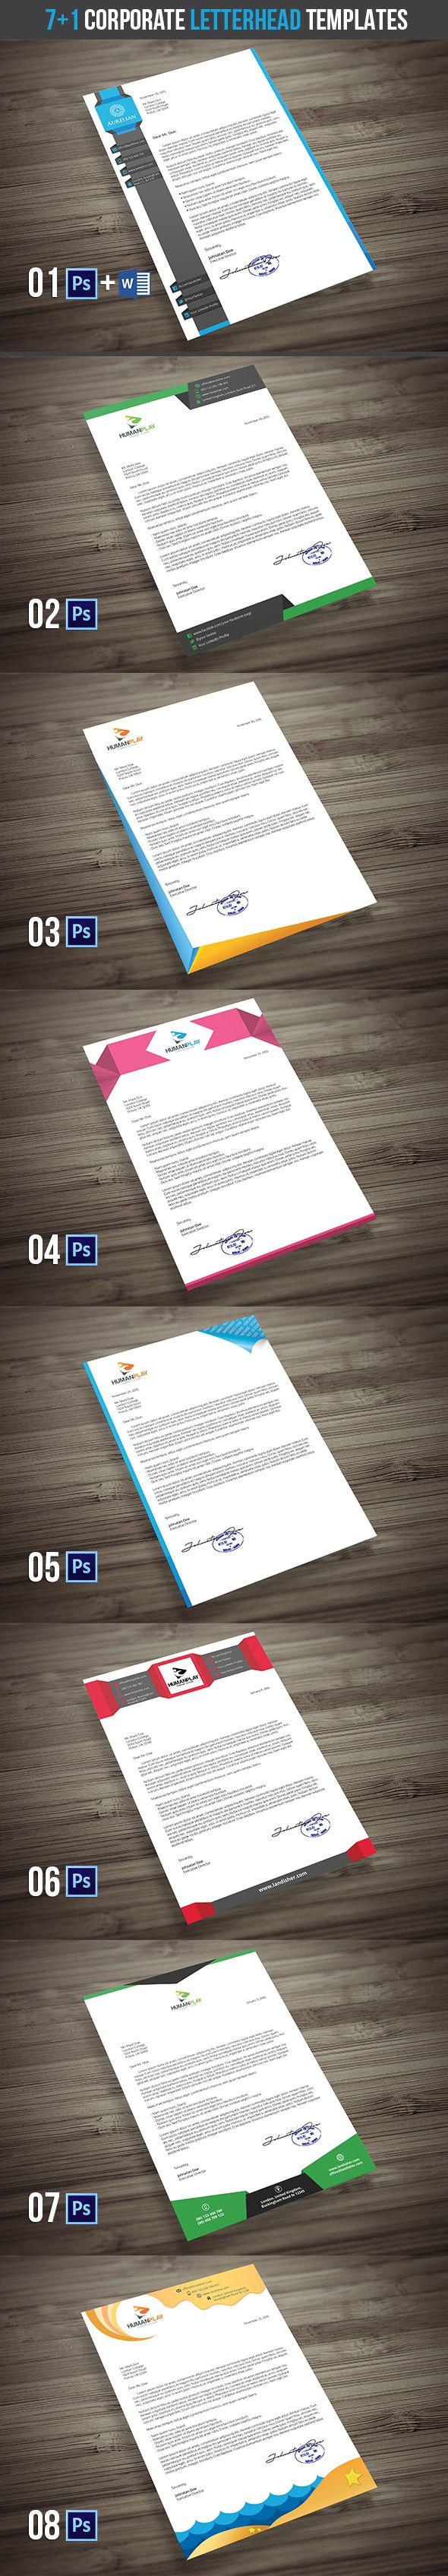 best 25 pany letterhead template ideas on pinterest